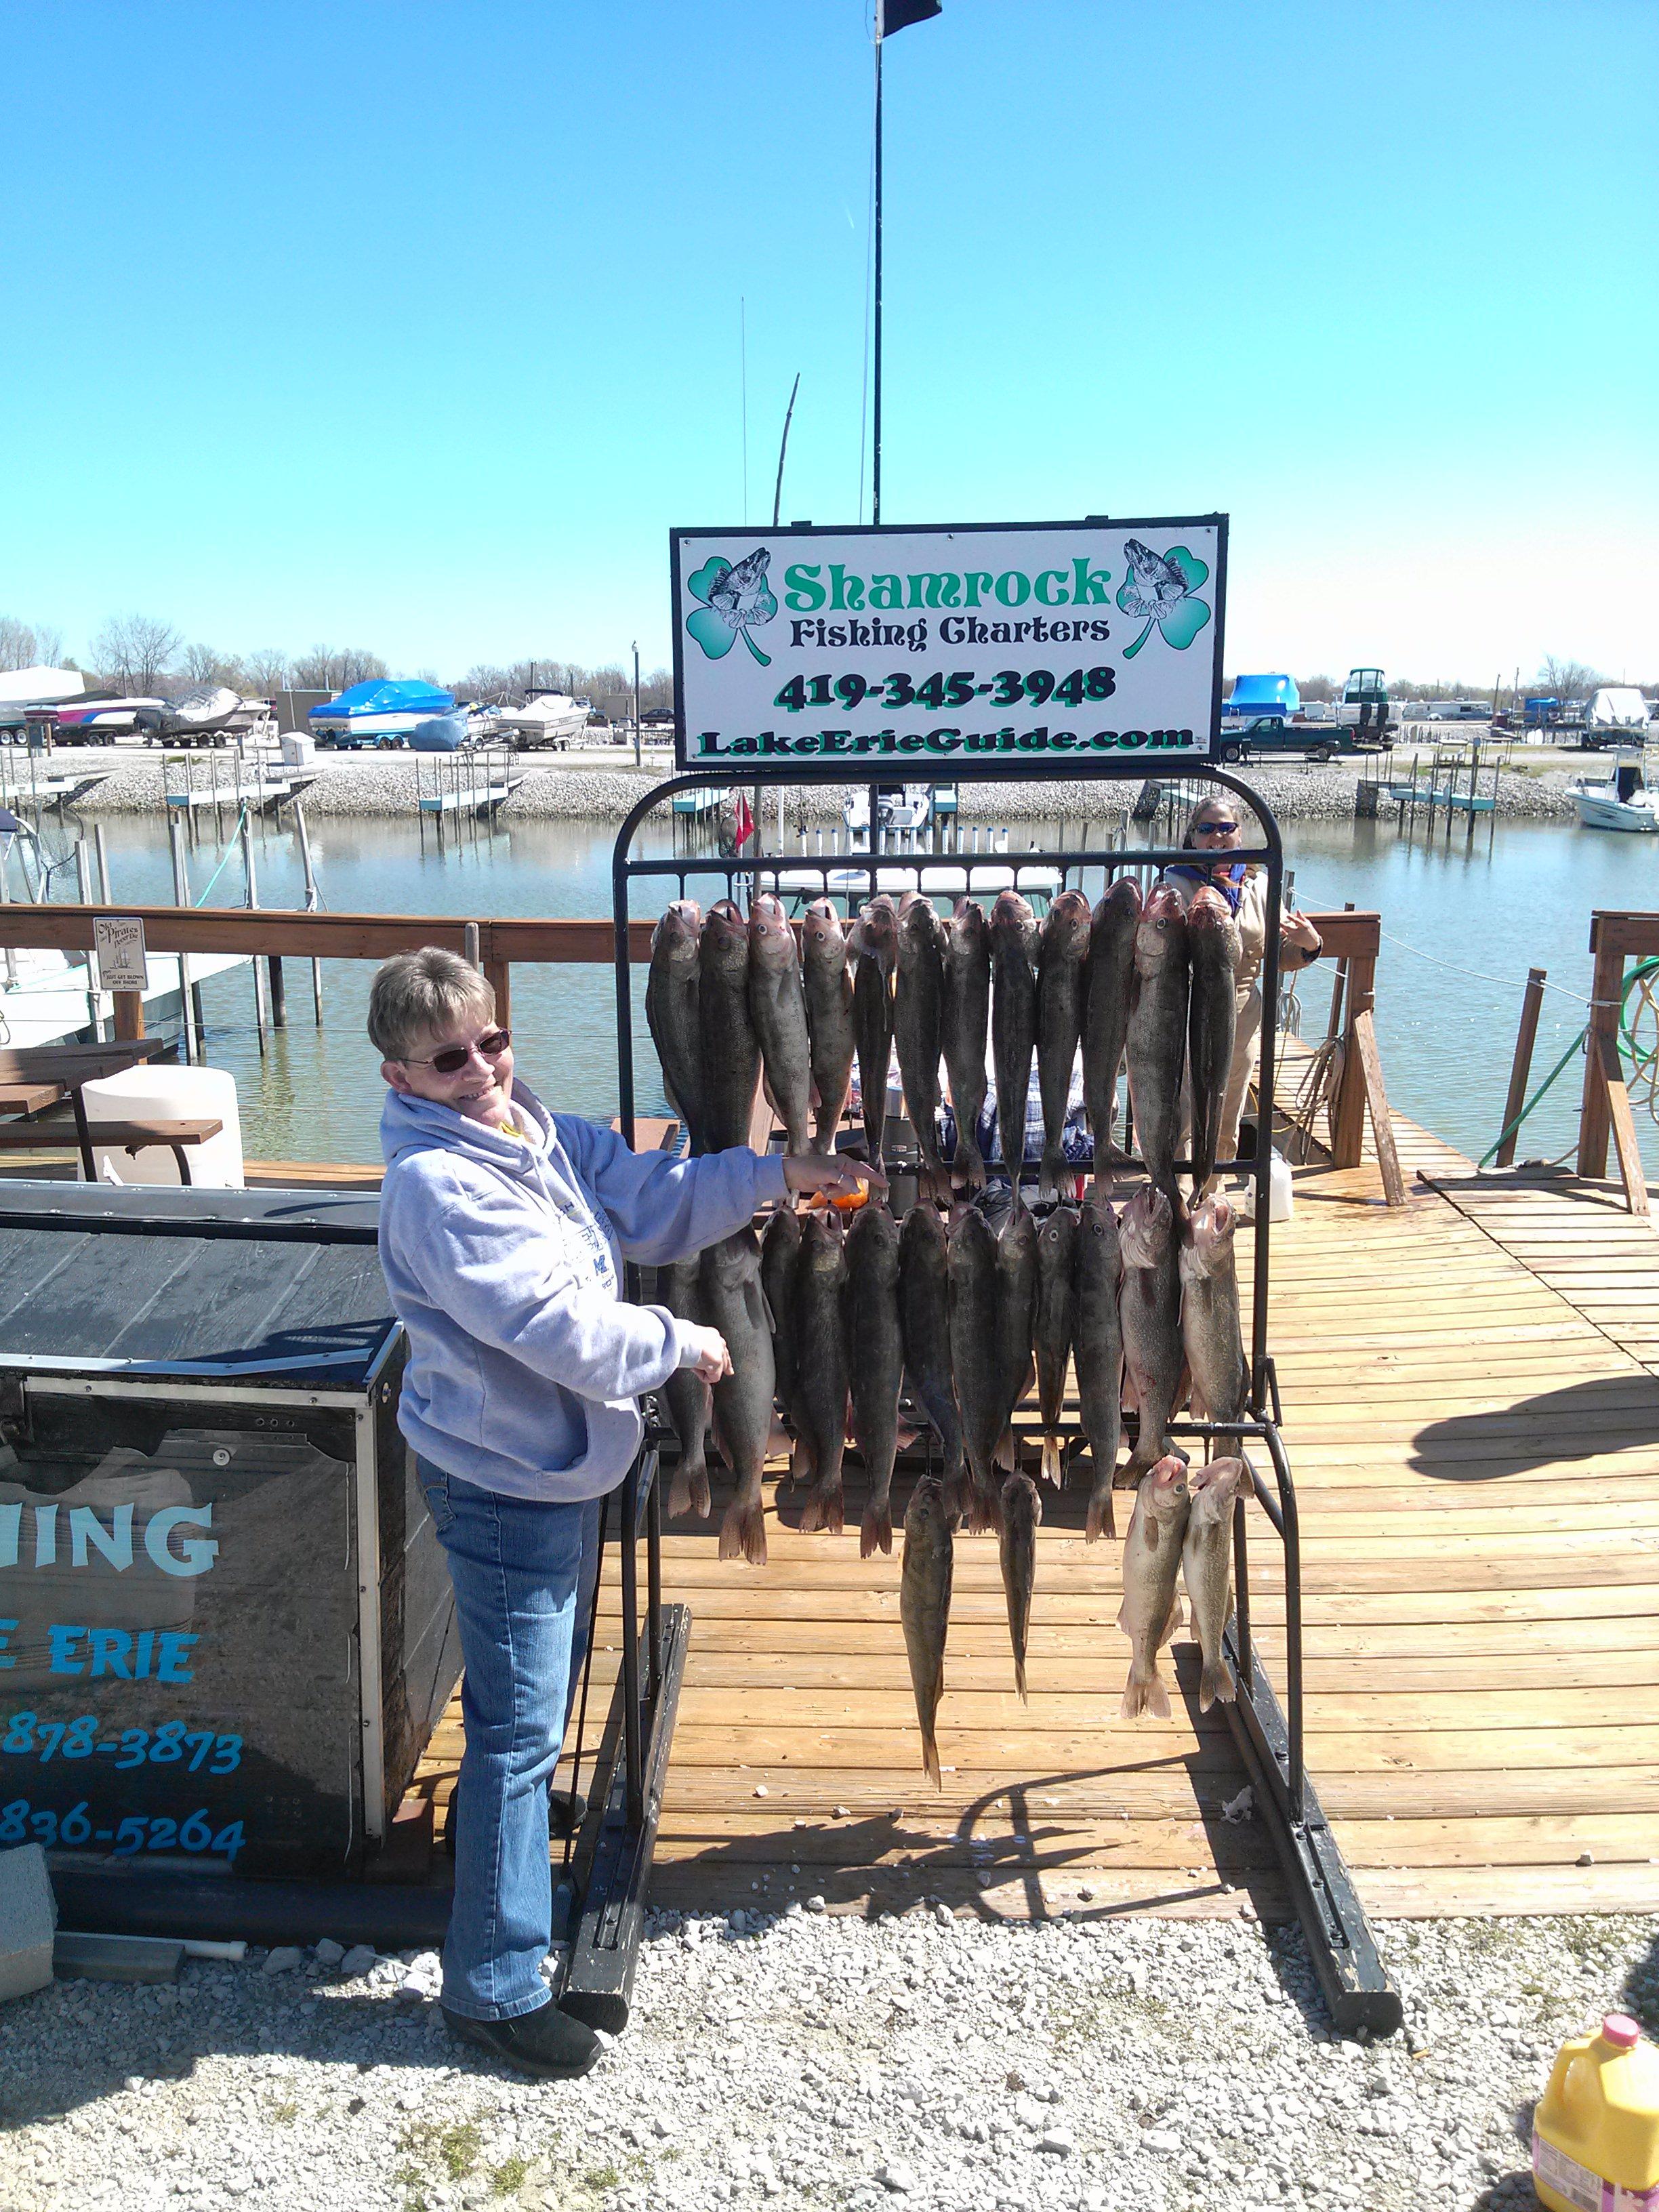 Lake erie walleye charters shamrock fishing charters for Ohio one day fishing license